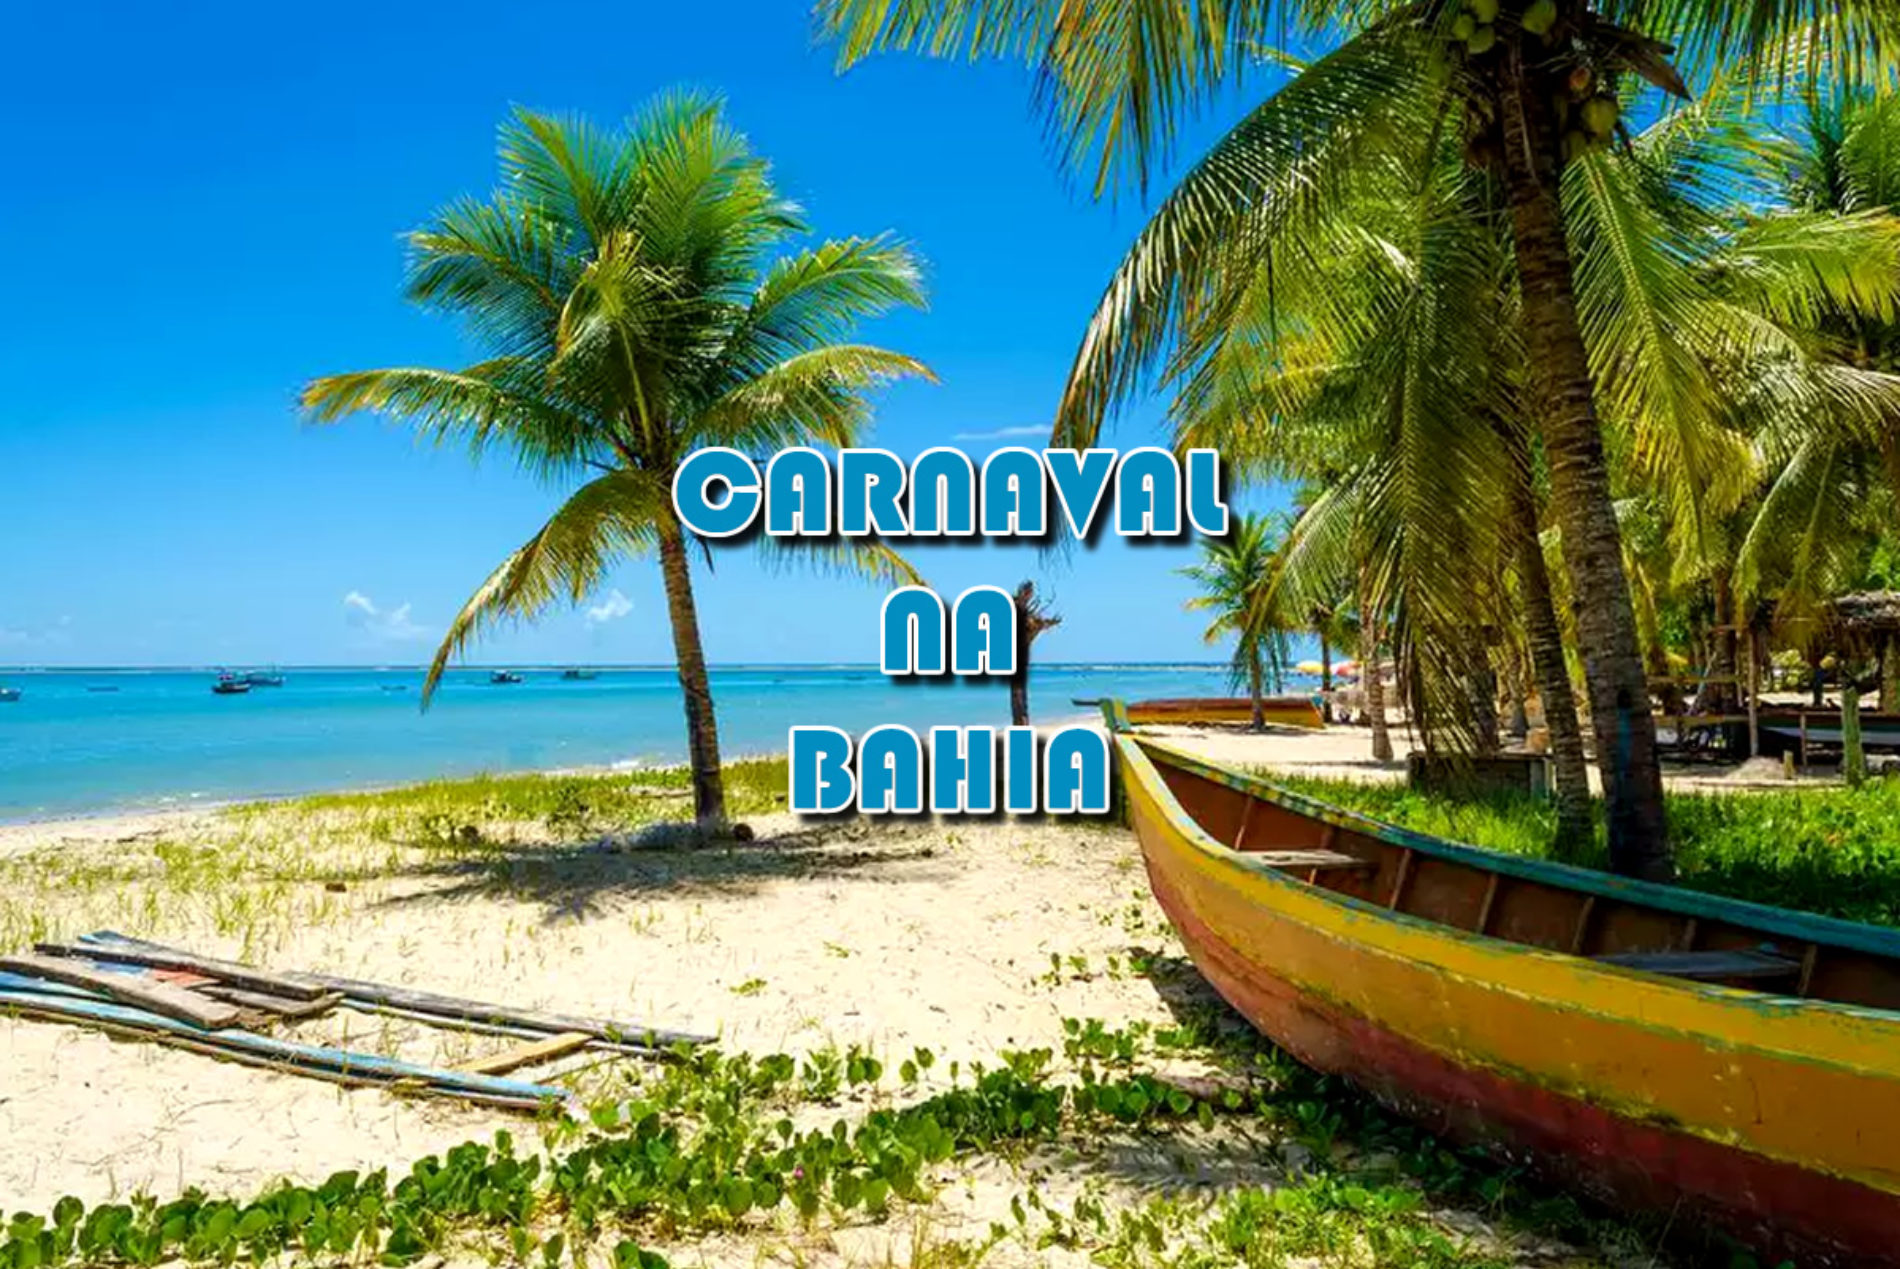 Carnaval 2020 na Bahia